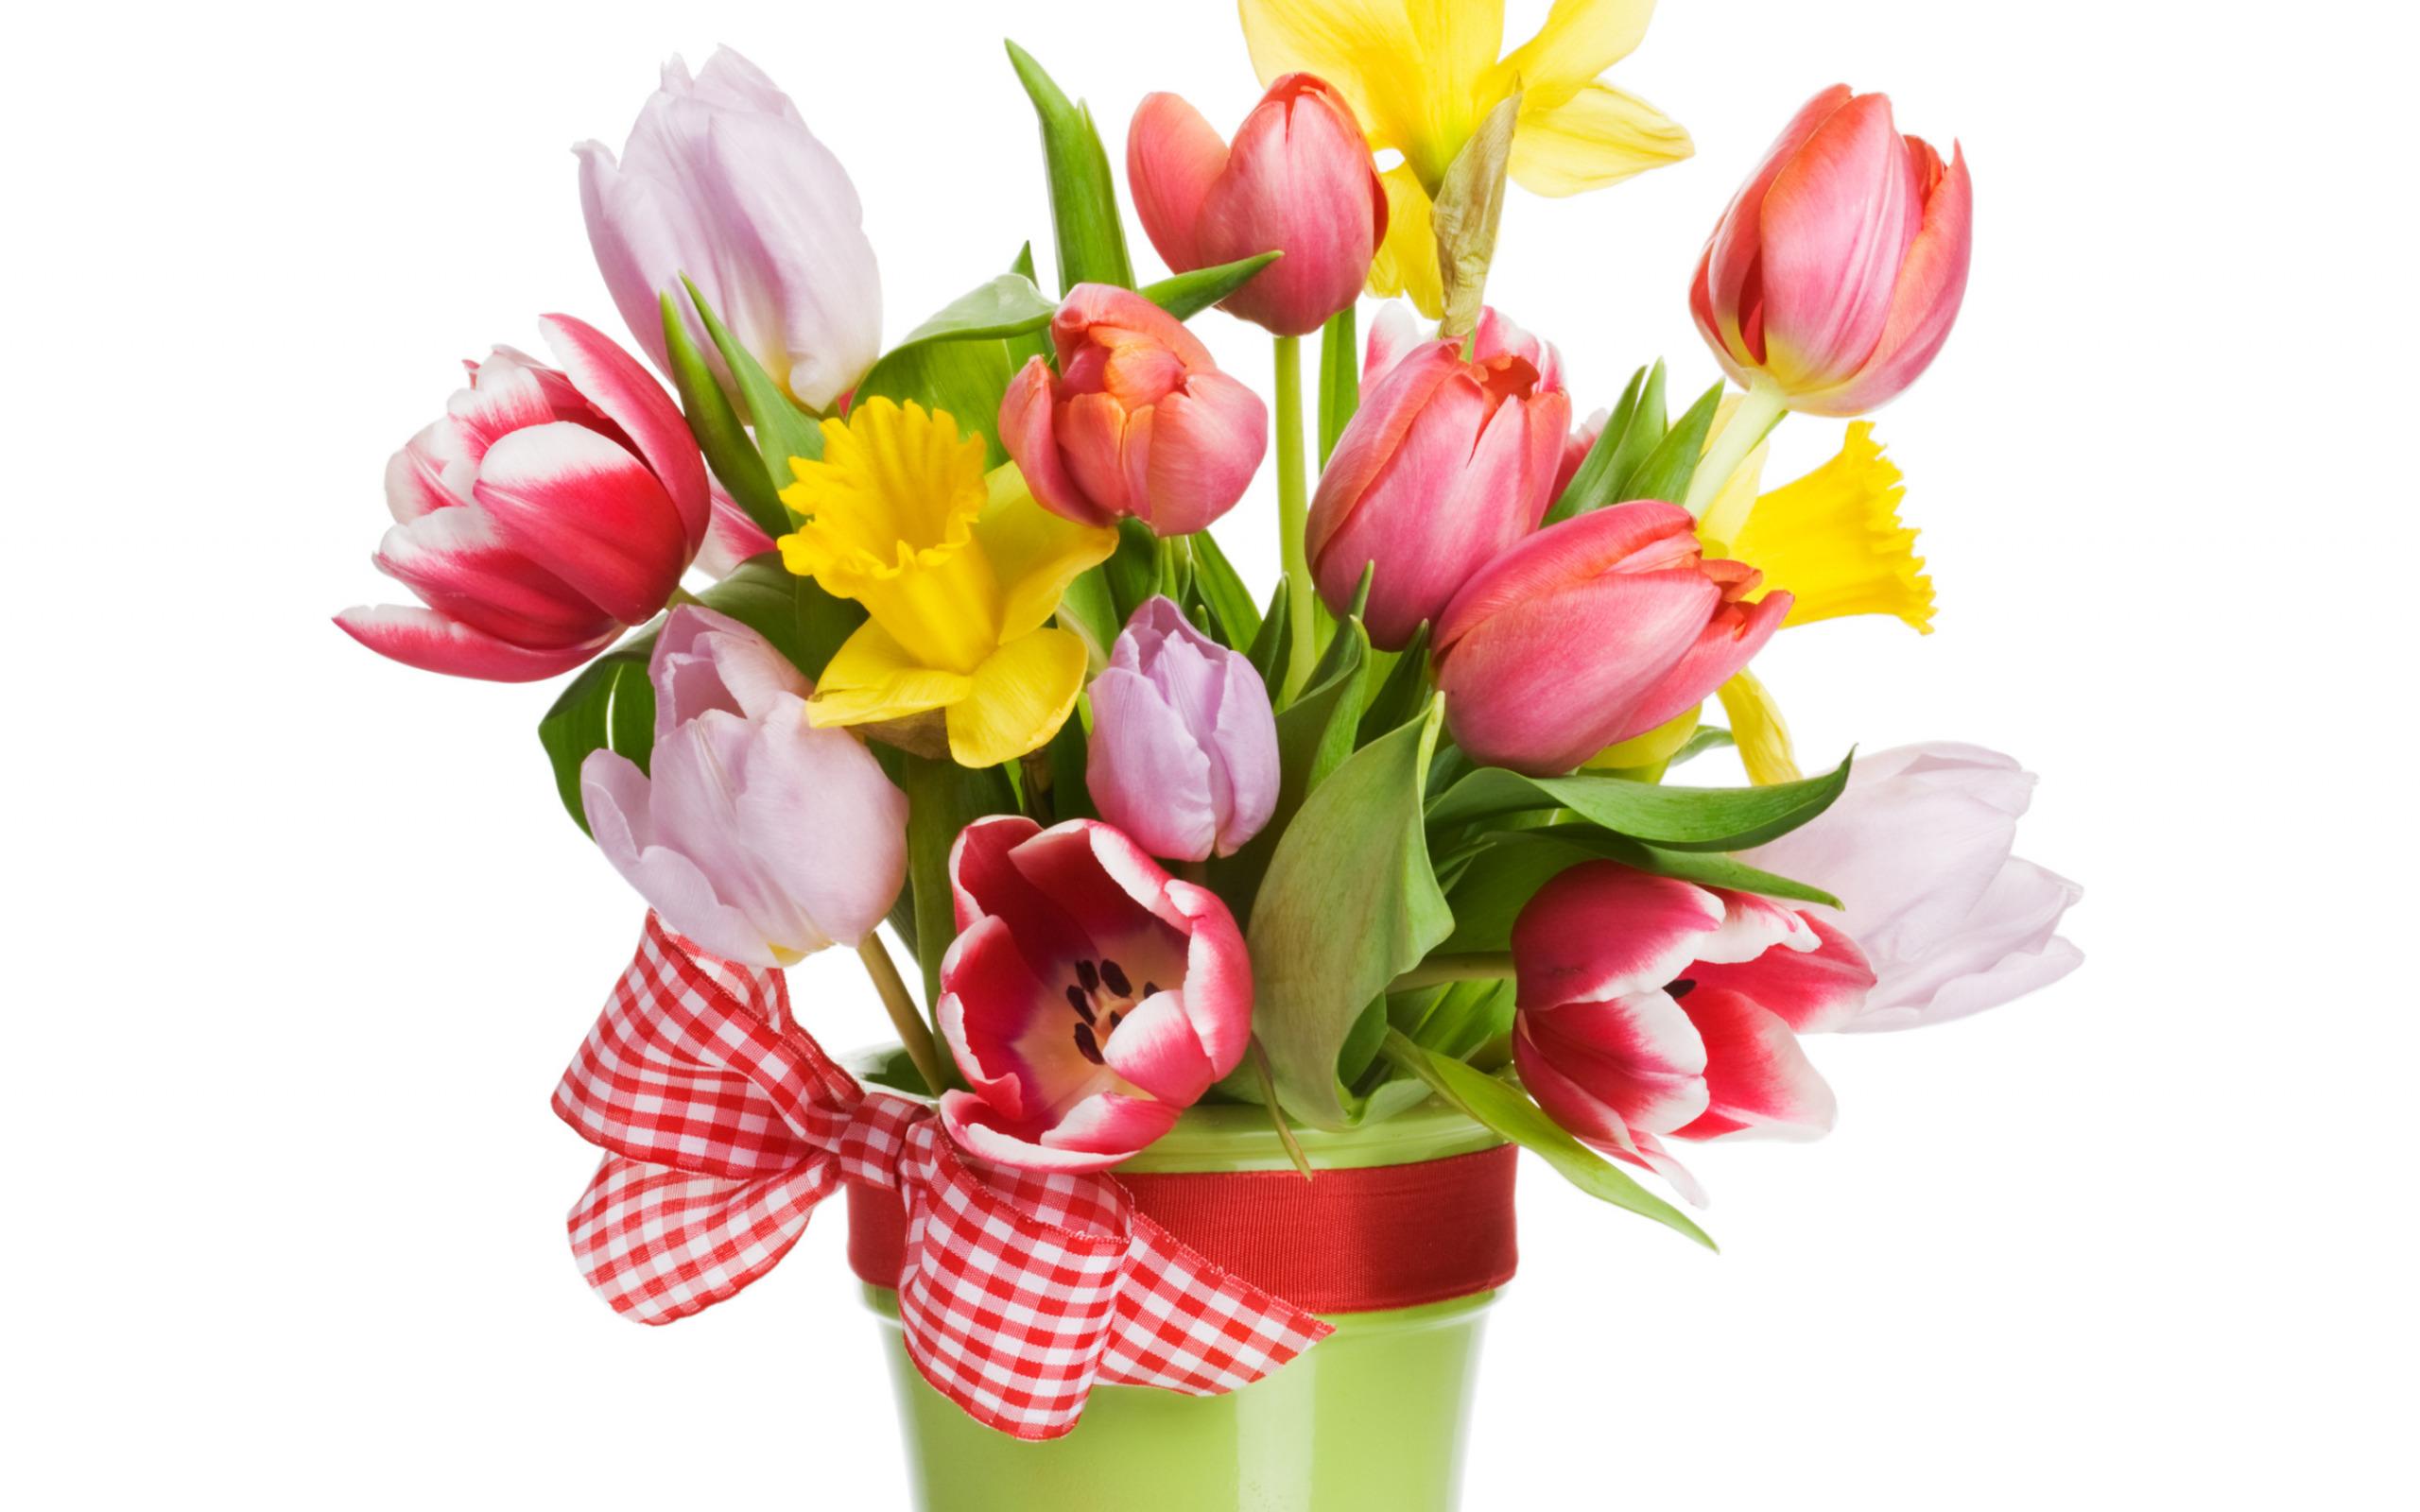 Весенние цветы в букете картинки